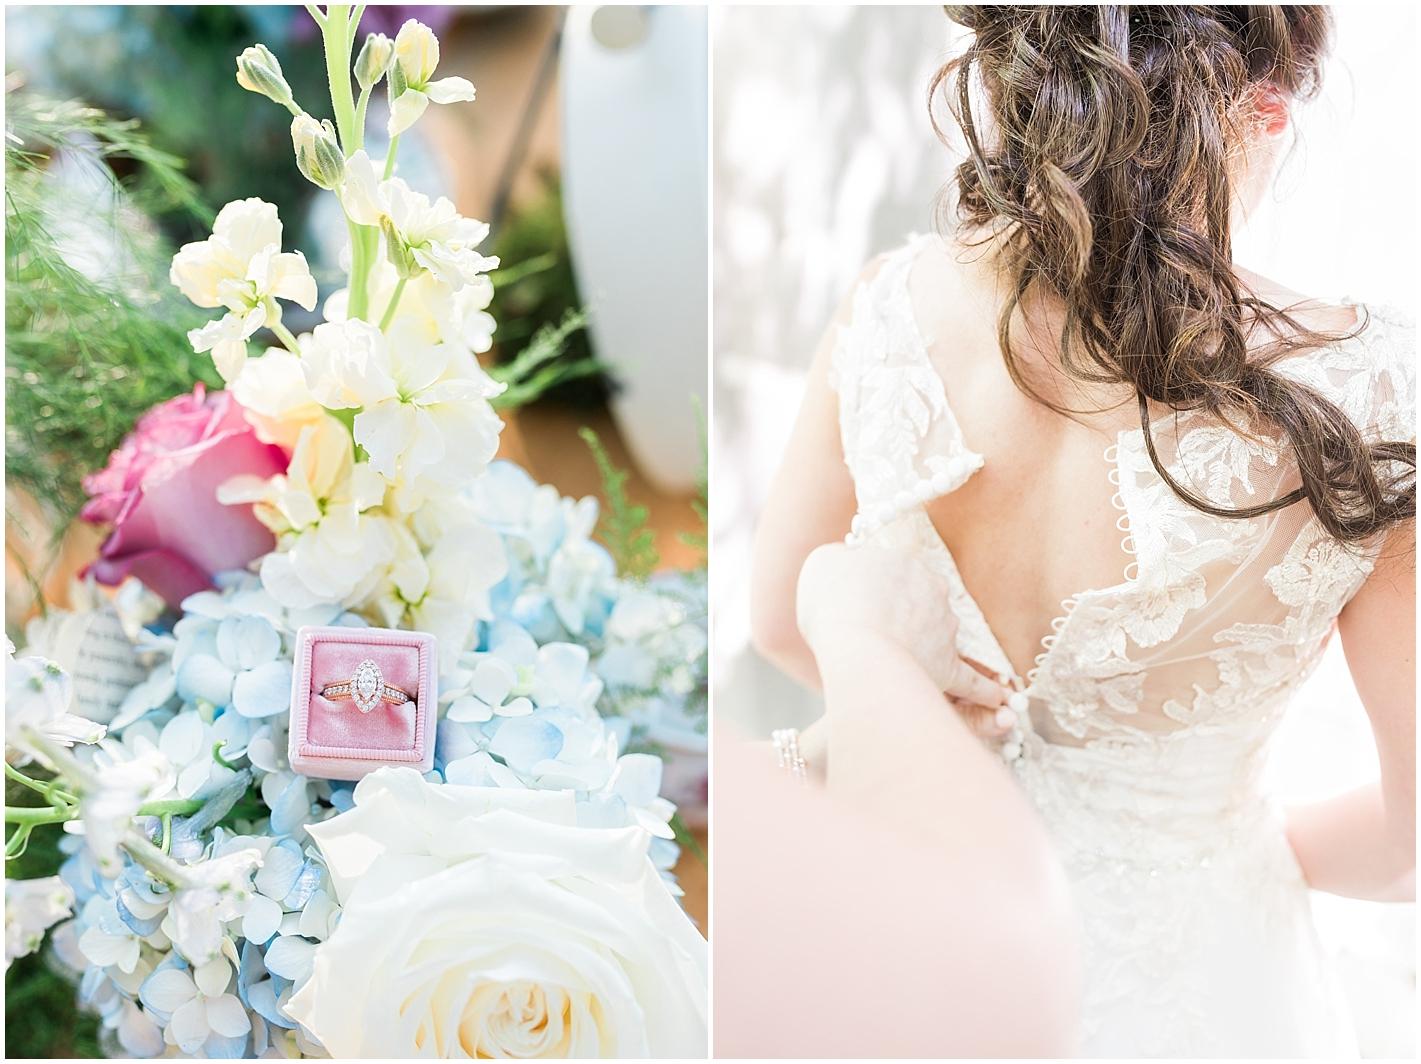 Timber Hill Farm Wedding Photos by Alyssa Parker Photography